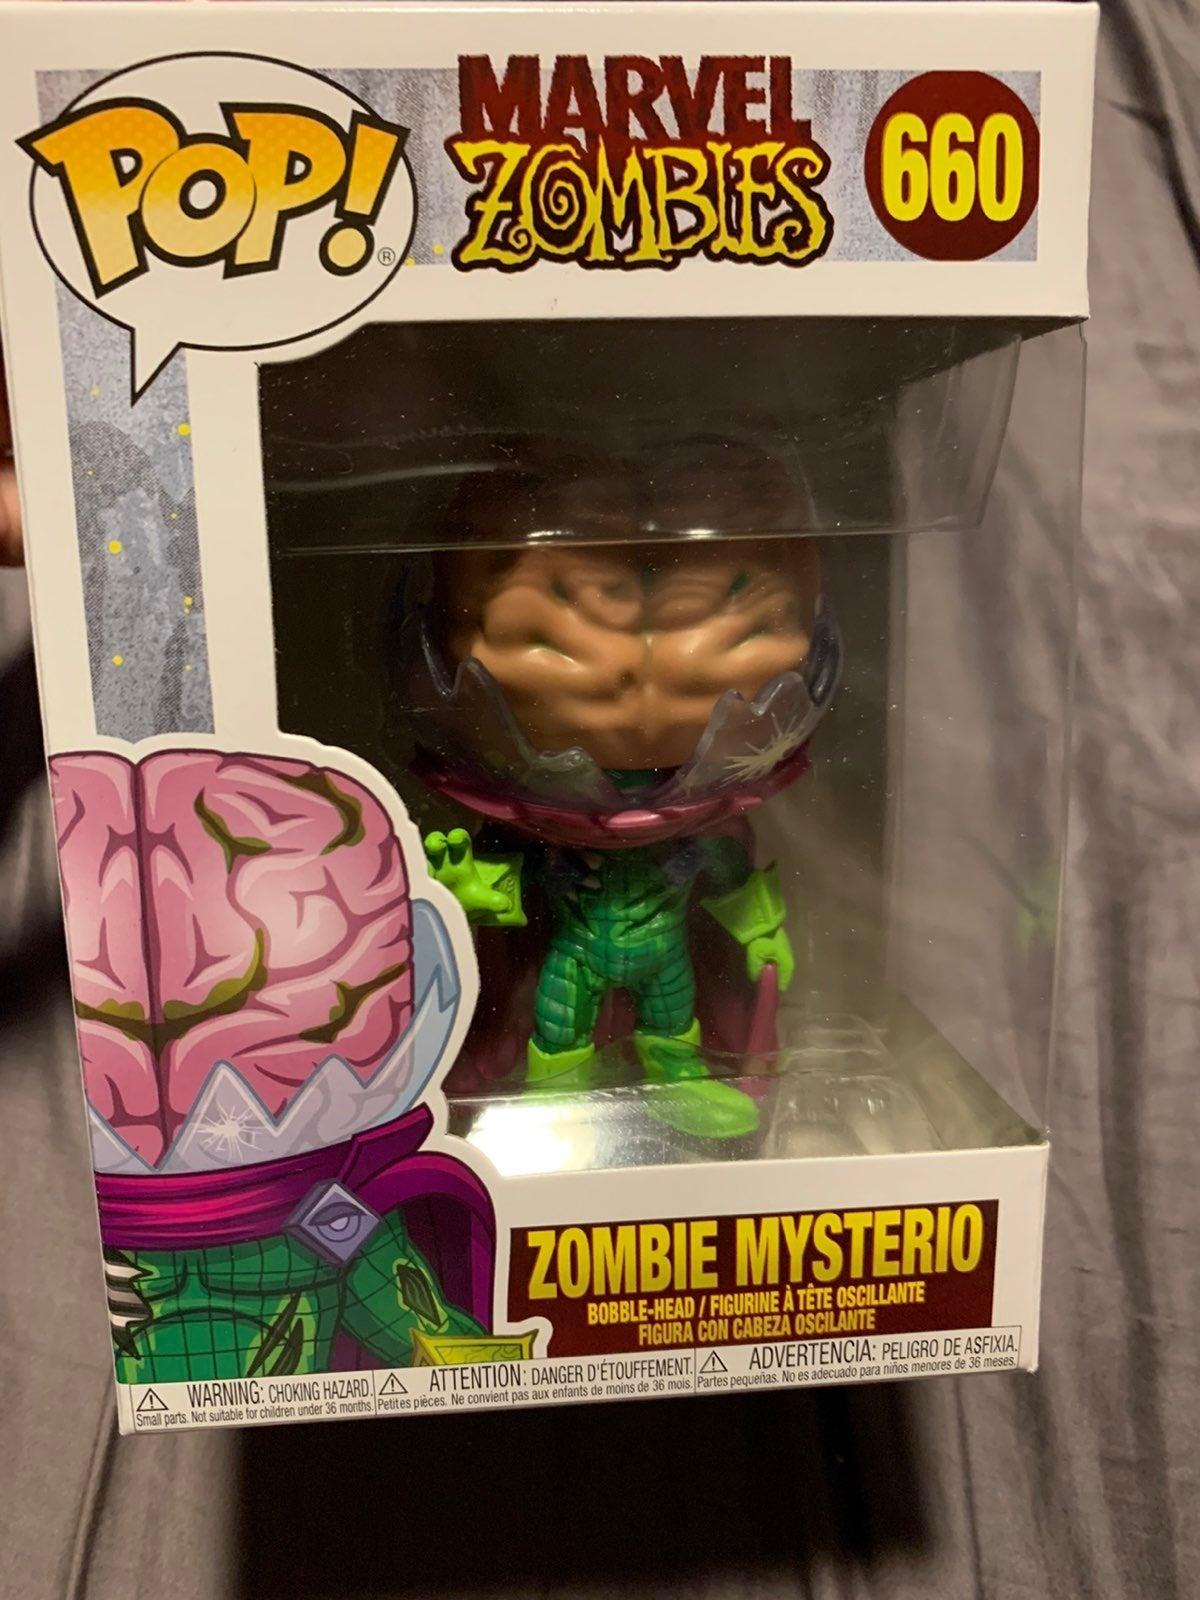 Marvel Zombie Mysterio Funko Pop